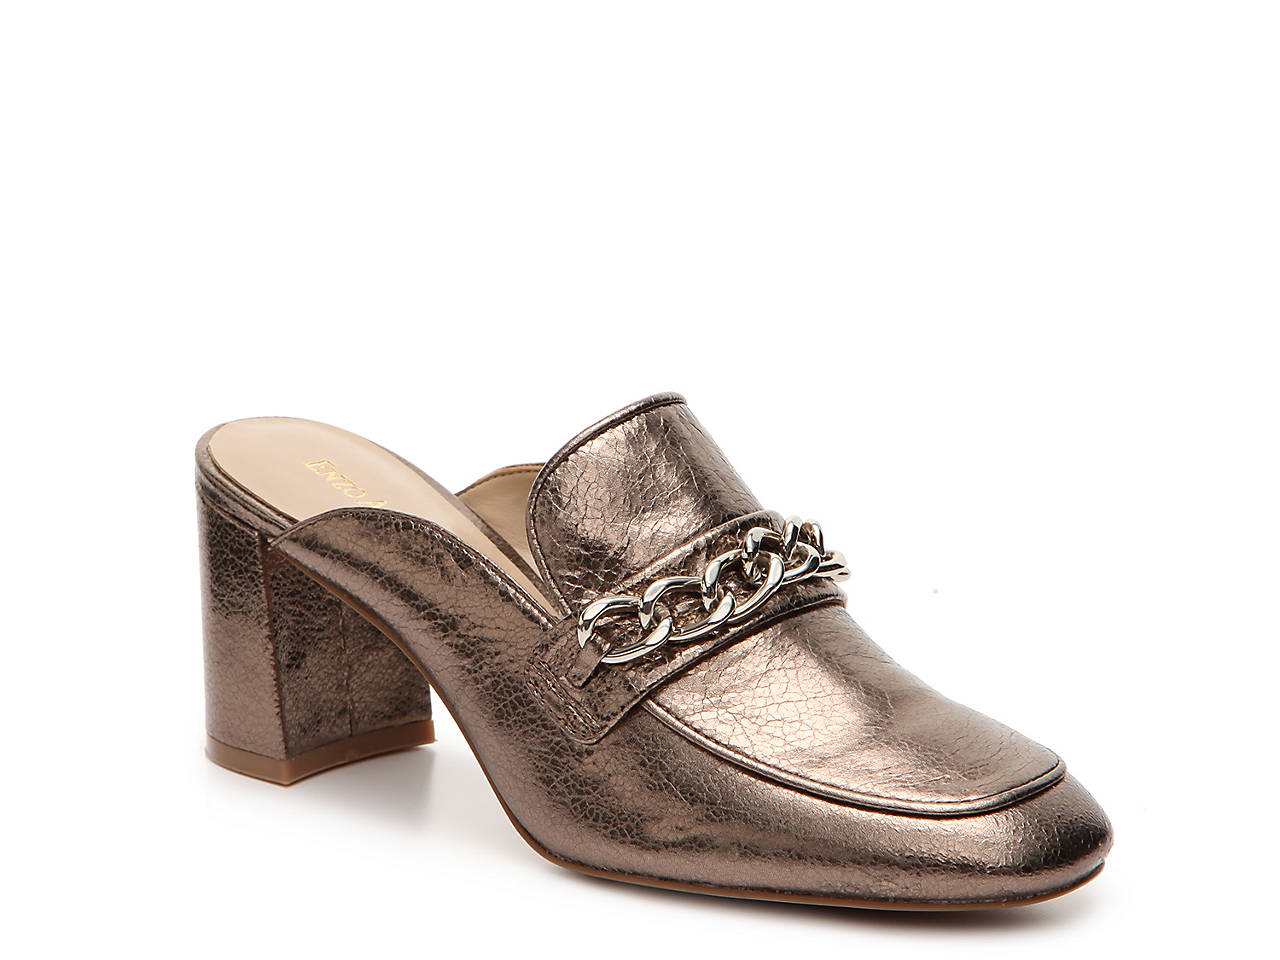 7f295c9b33b7 Enzo Angiolini Gilian Mule Women s Shoes